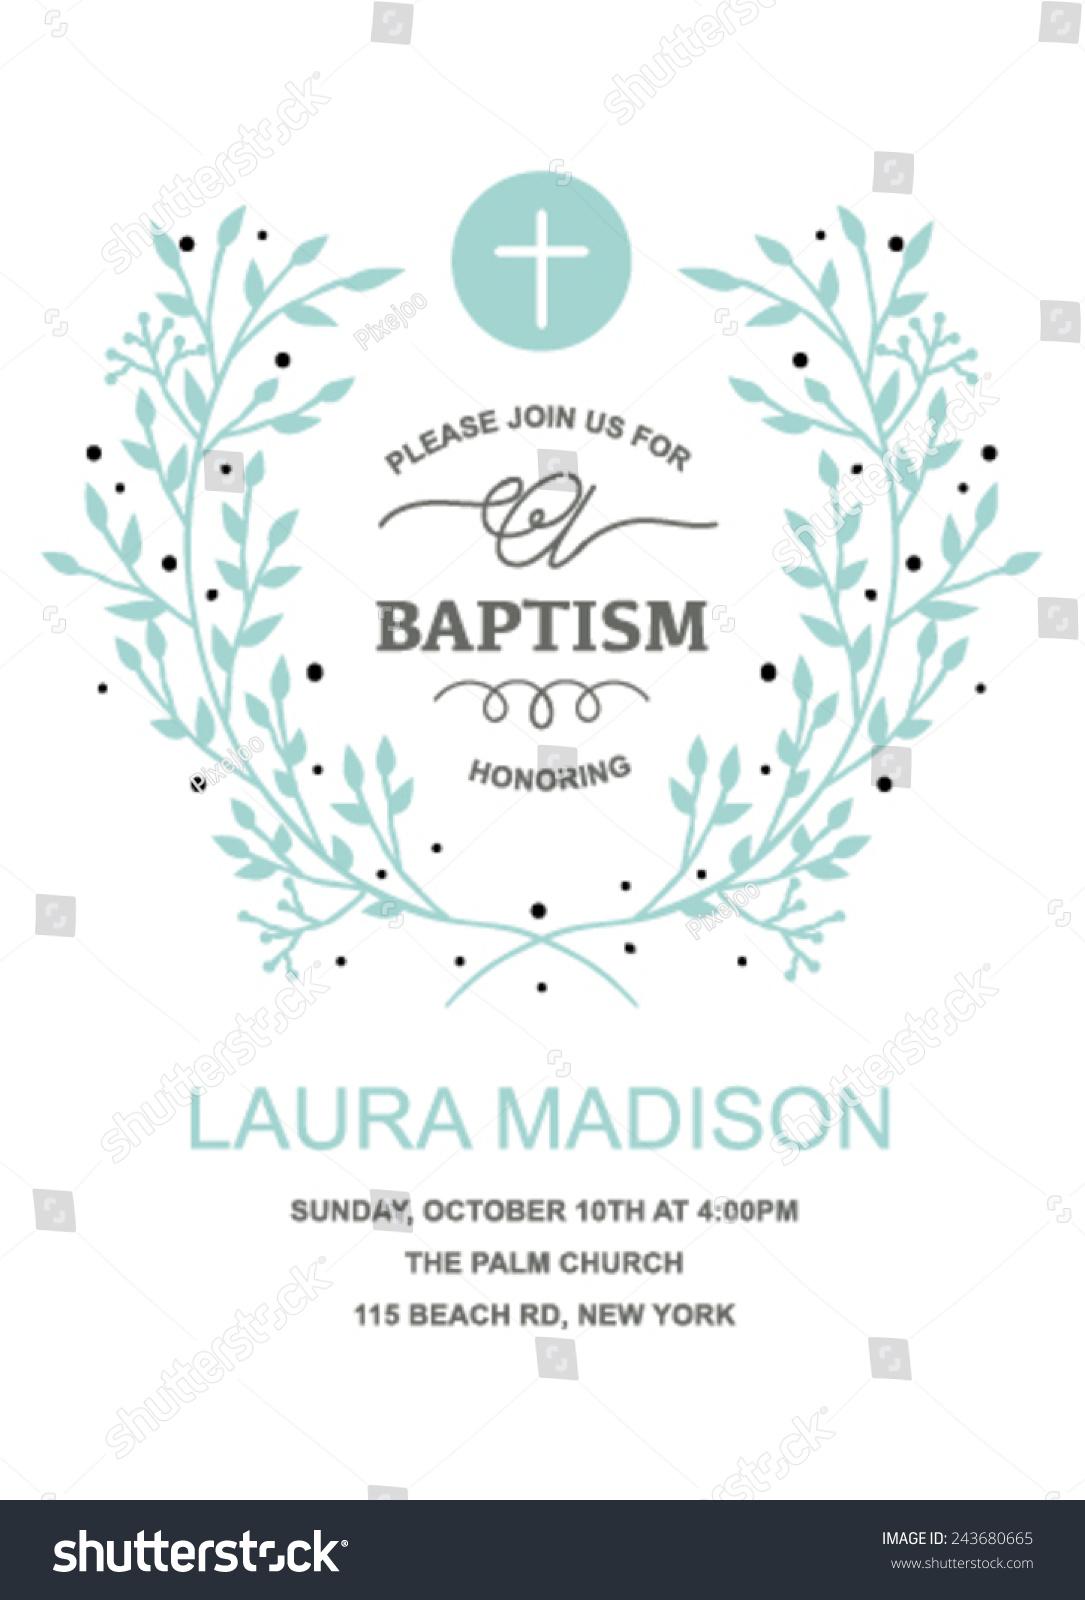 christening background white - photo #38